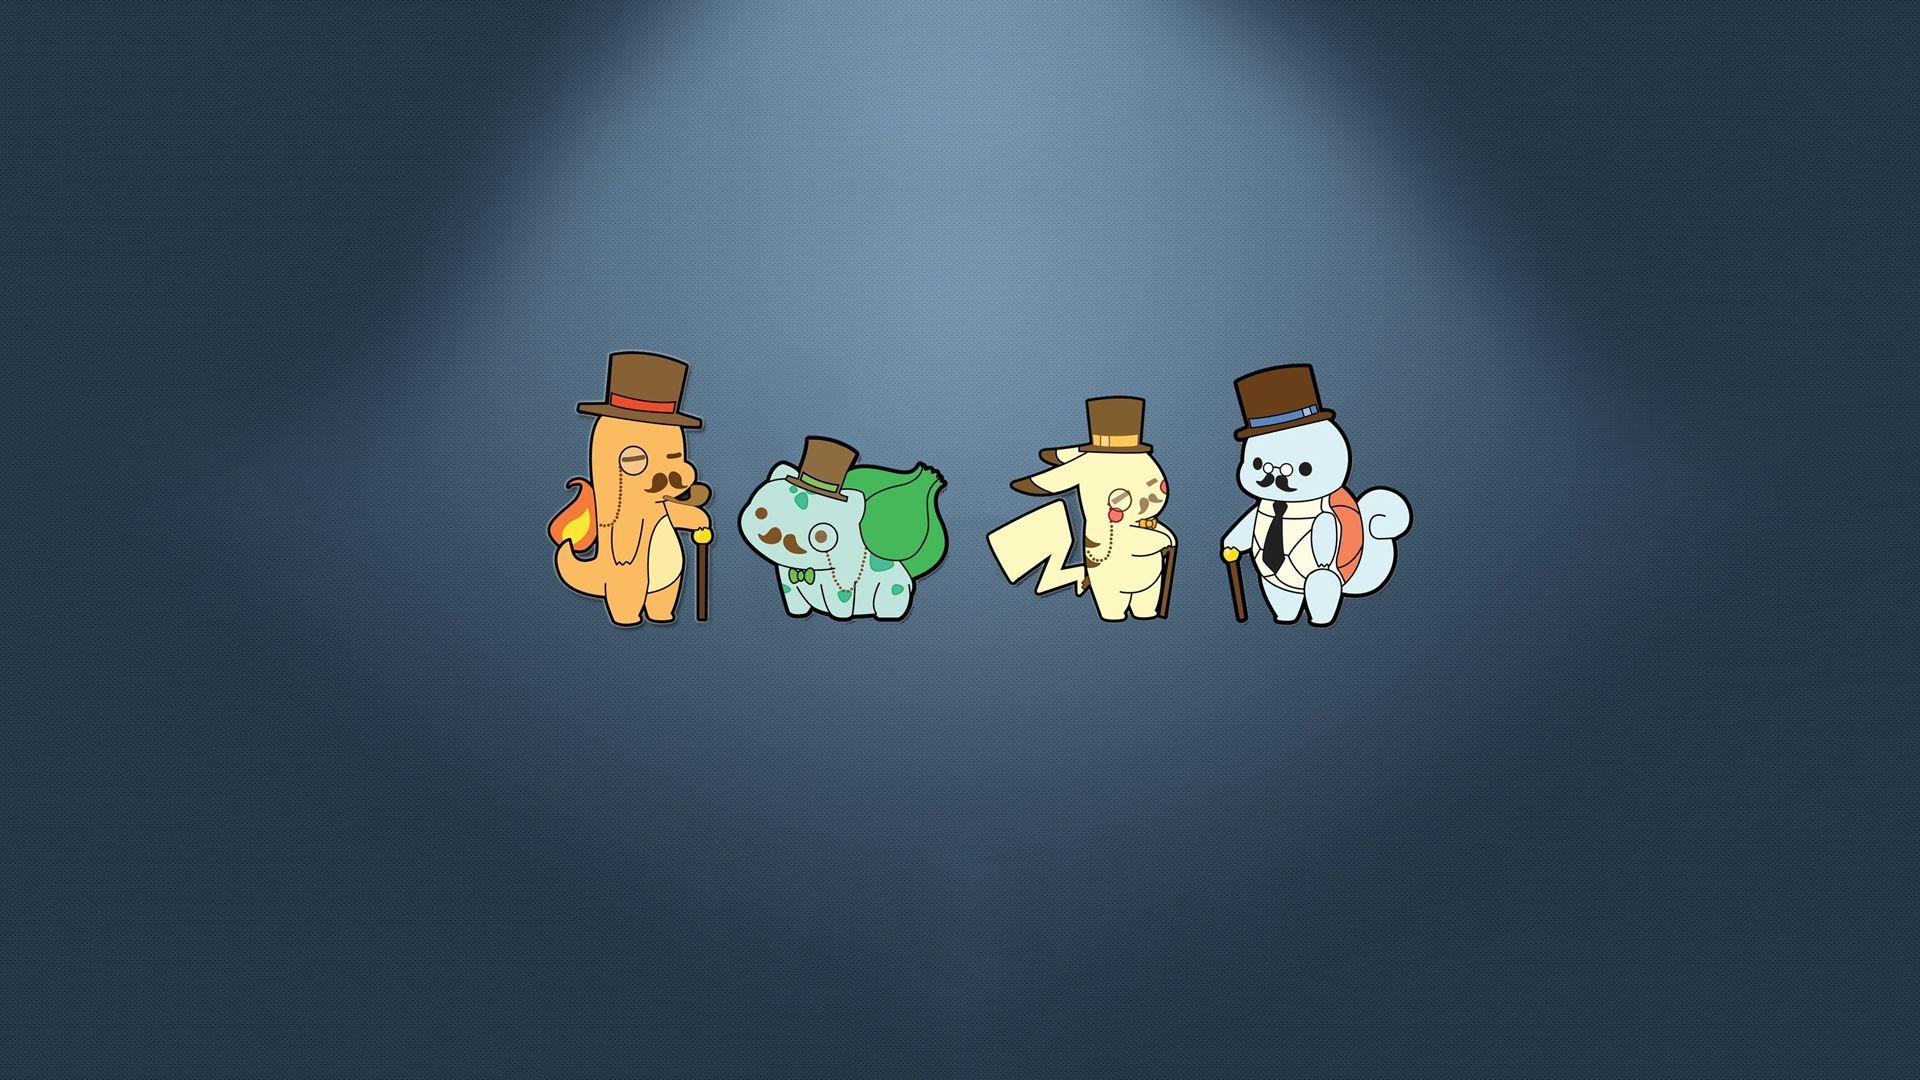 Gentlemen Pokemon wallpaper | Caricaturas e ilustraciòn ...